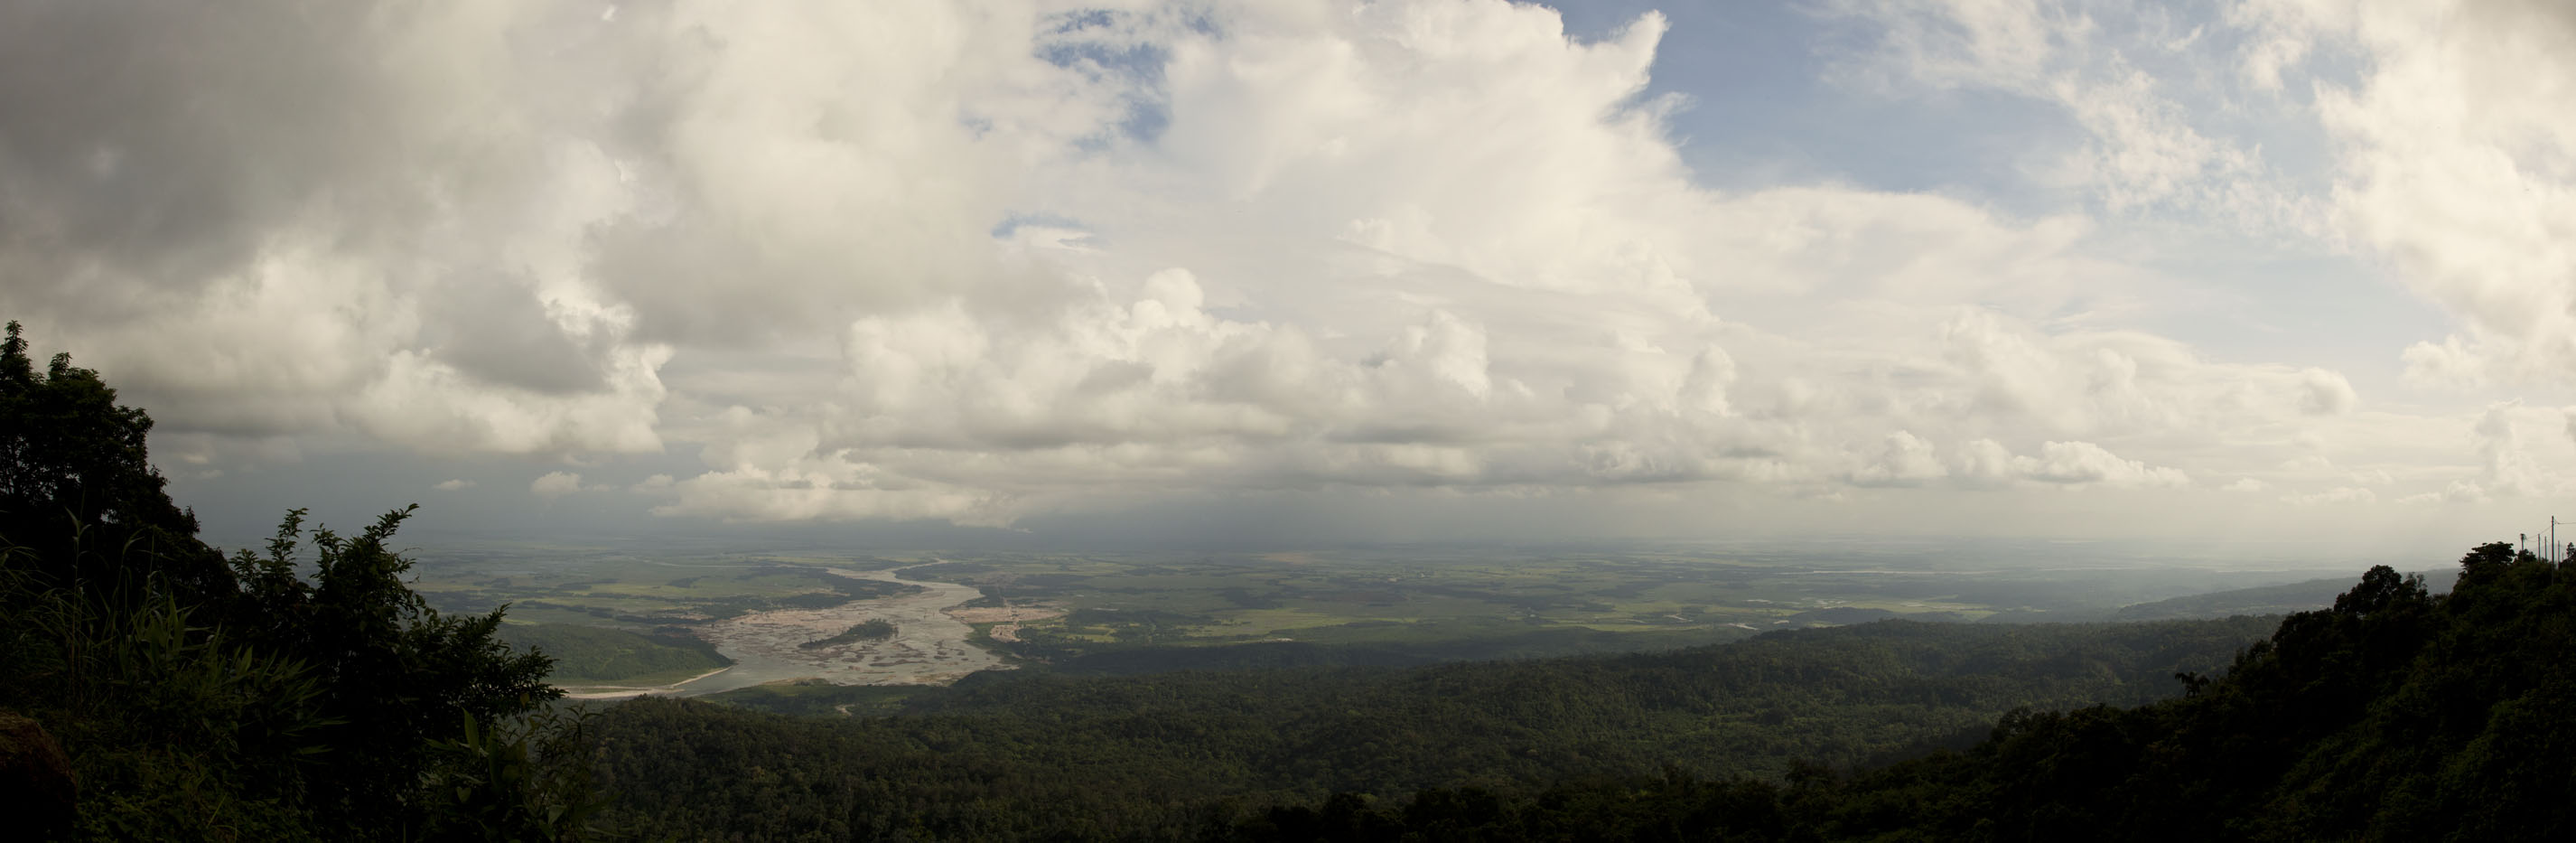 Meghalaya_panorama